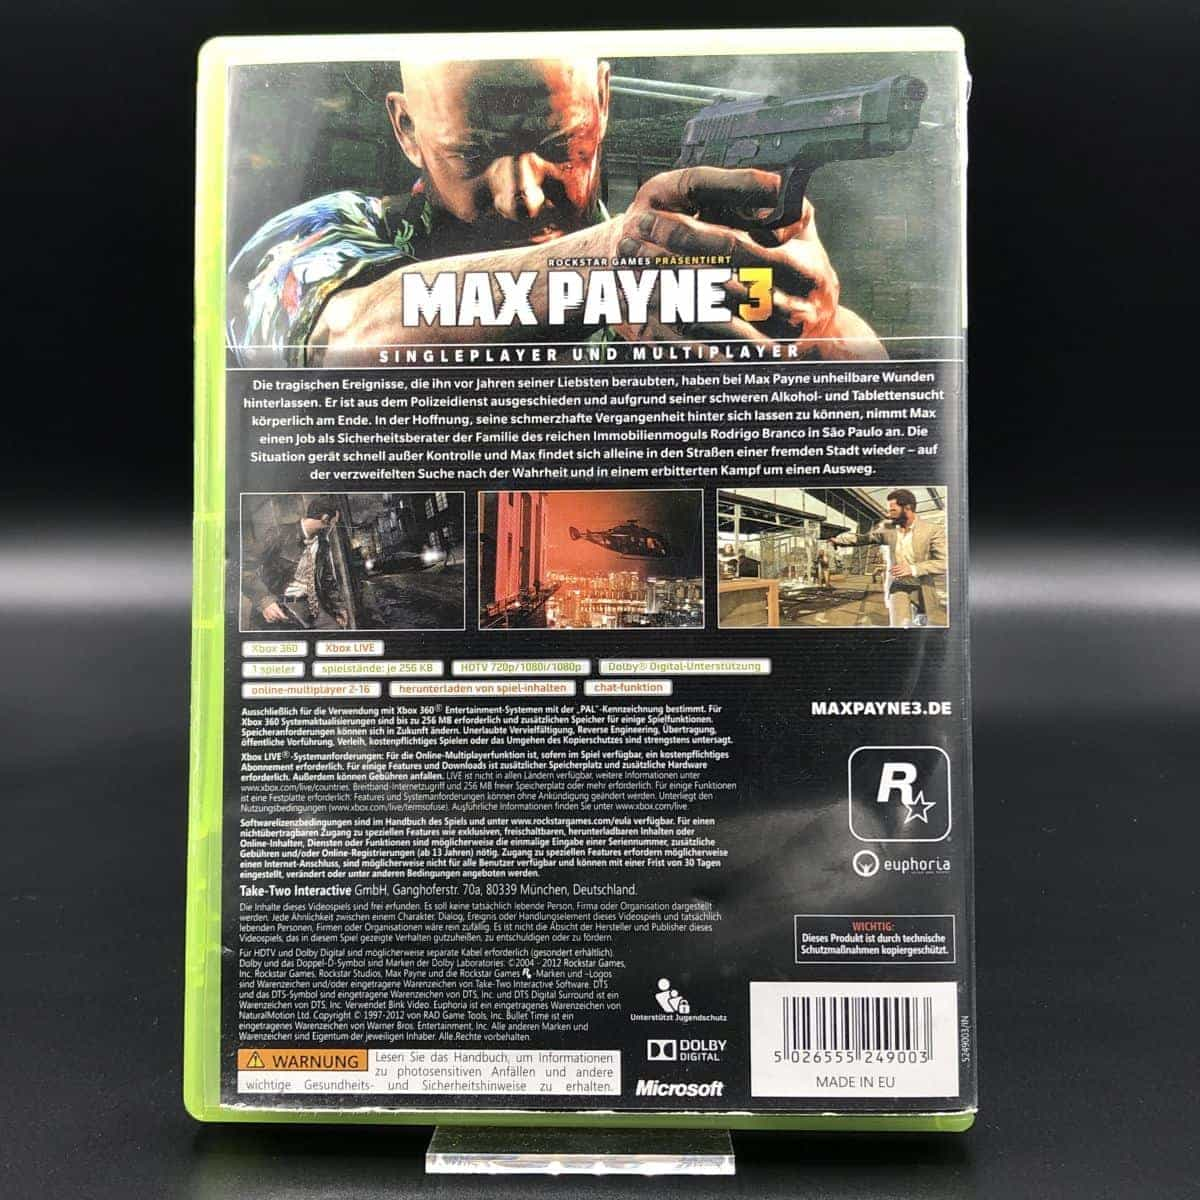 Max Payne 3 (Komplett) (Gut) XBOX 360 (FSK18)